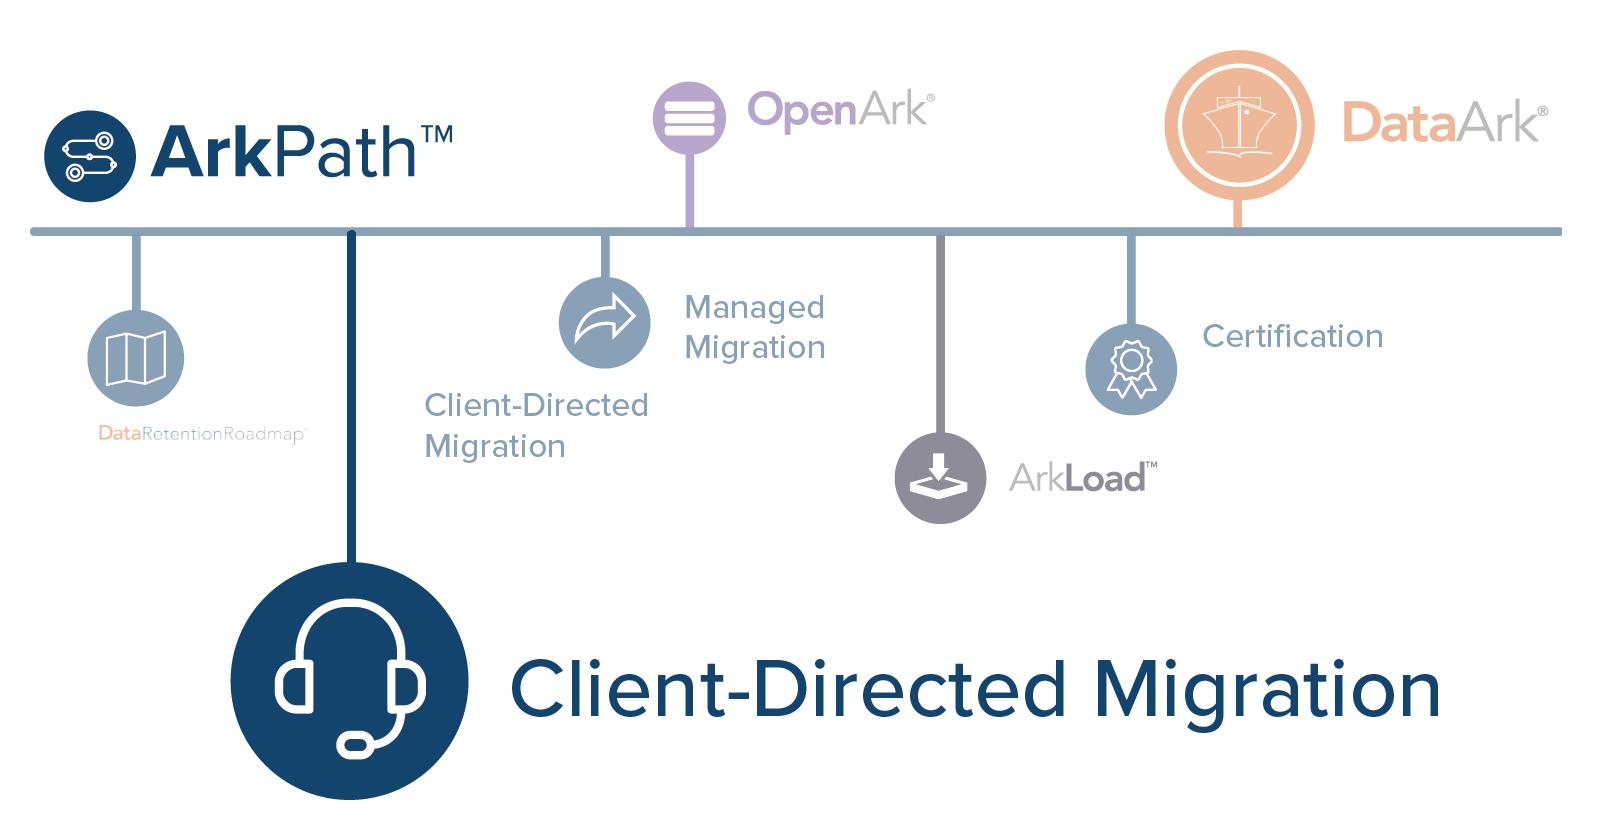 Client Directed Migration